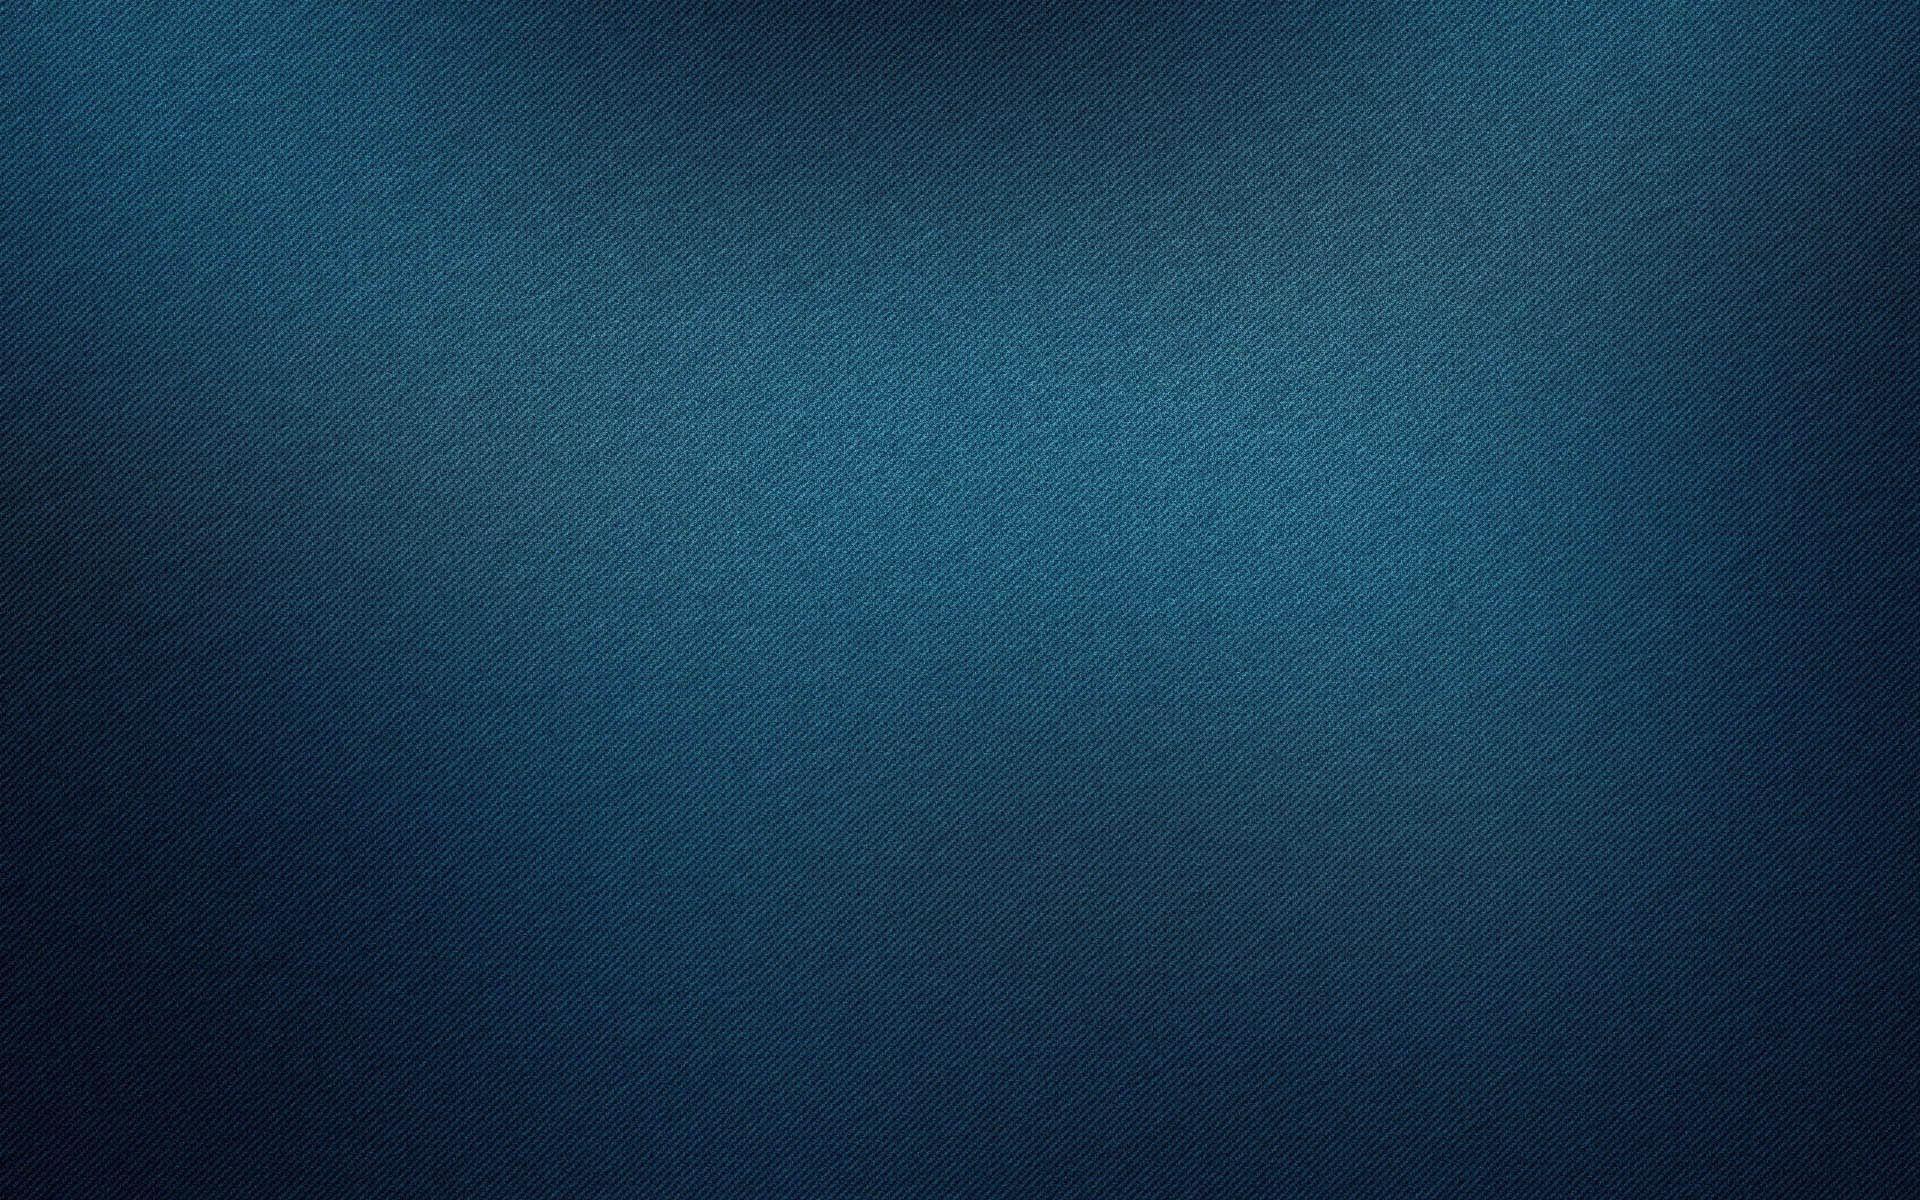 dark blue backgrounds image wallpaper cave